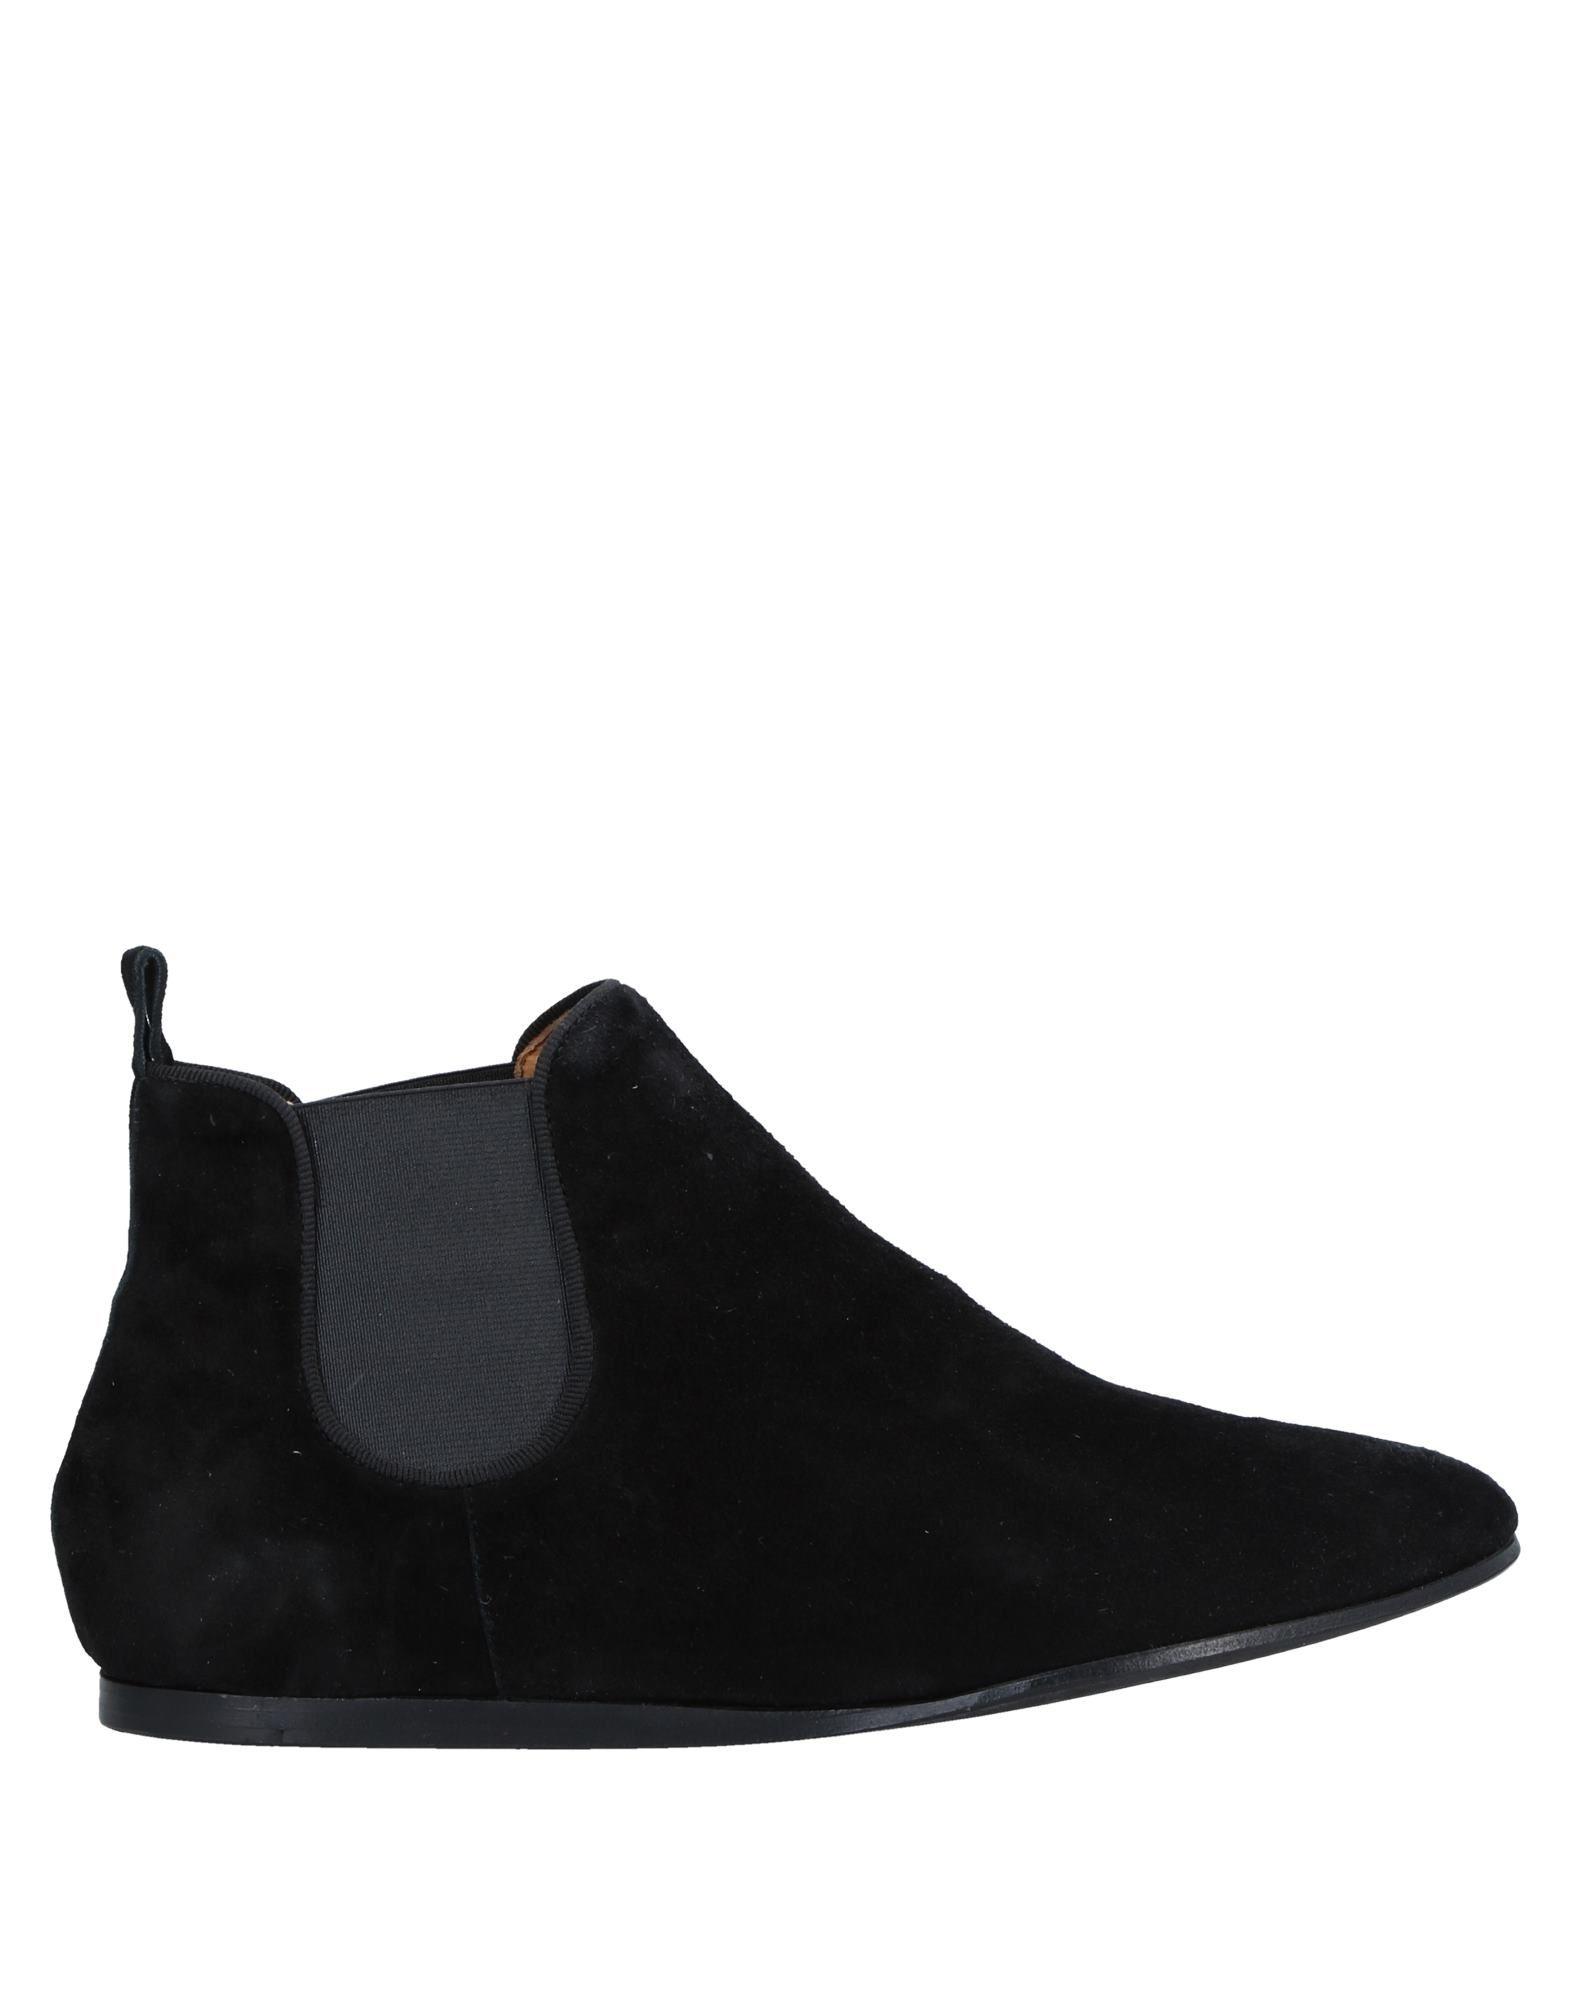 Rabatt Schuhe The Last Conspiracy Chelsea Boots Damen  11532434WO